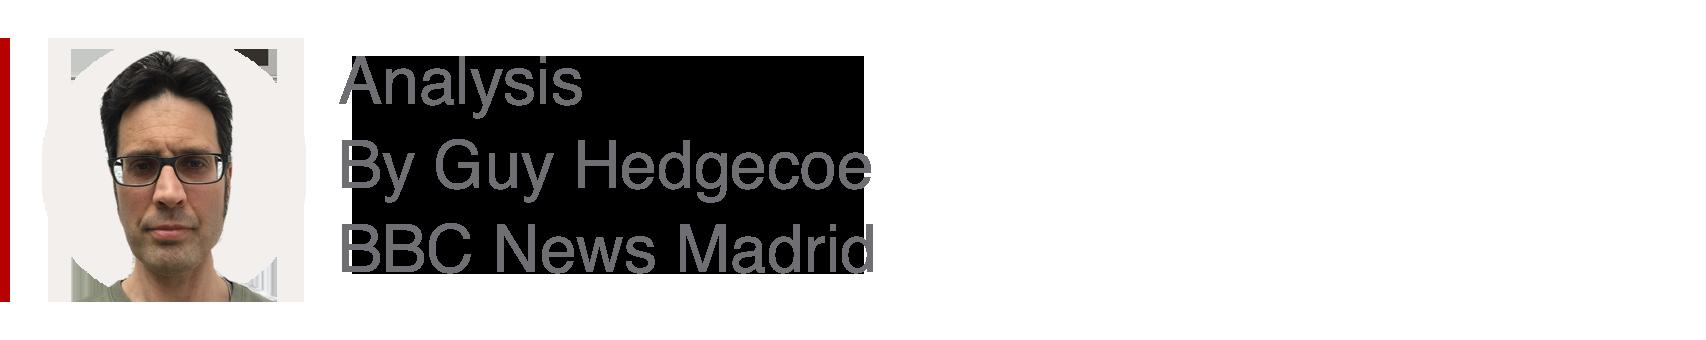 Analysis box by Guy Hedgecoe, BBC News Madrid